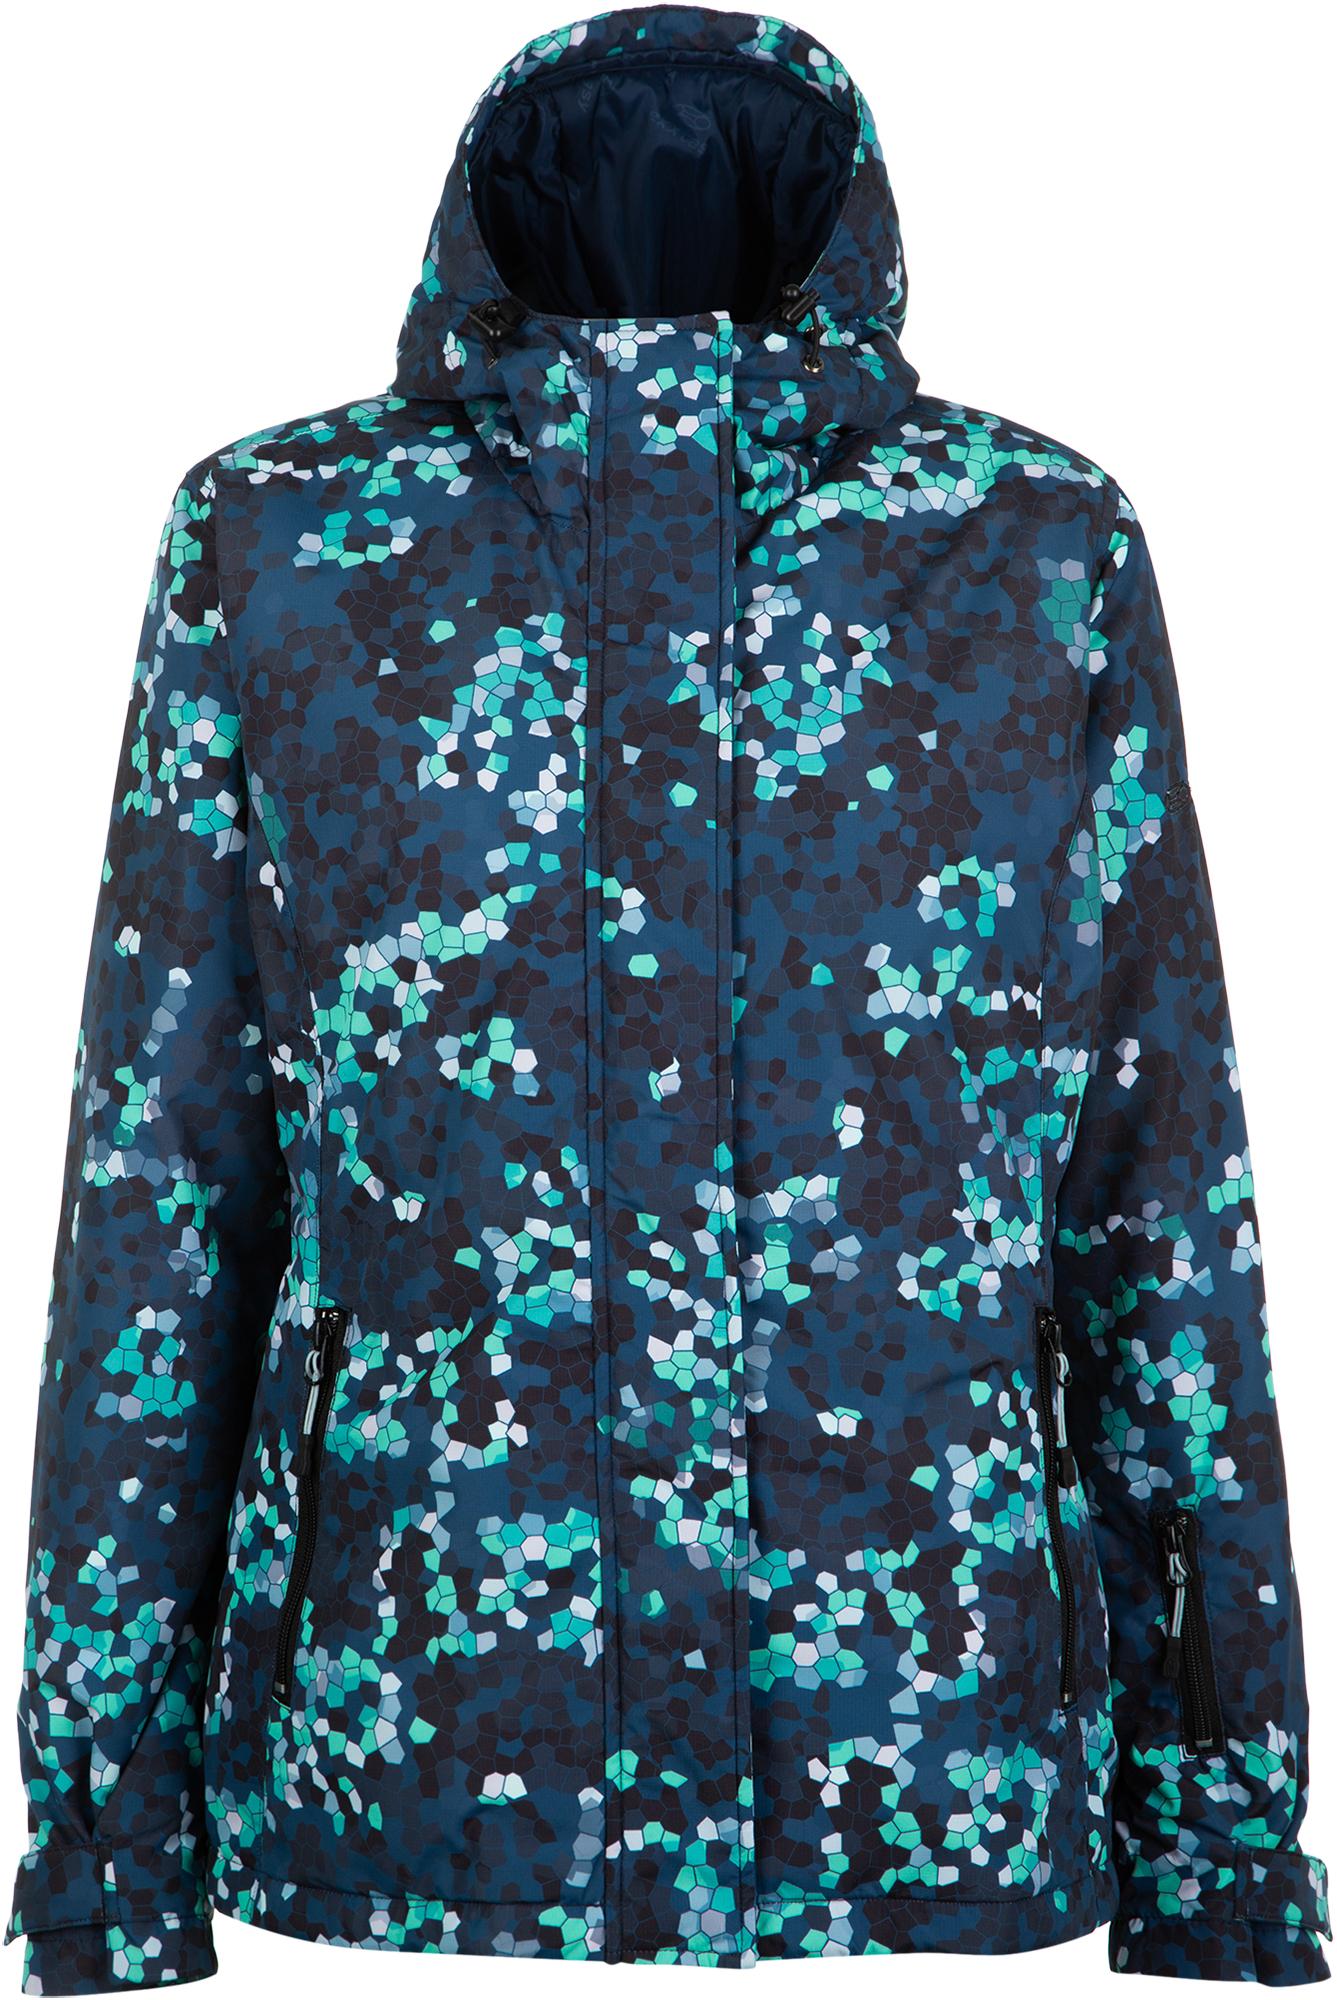 цена на Exxtasy Куртка утепленная женская Exxtasy Stavanger, размер 48